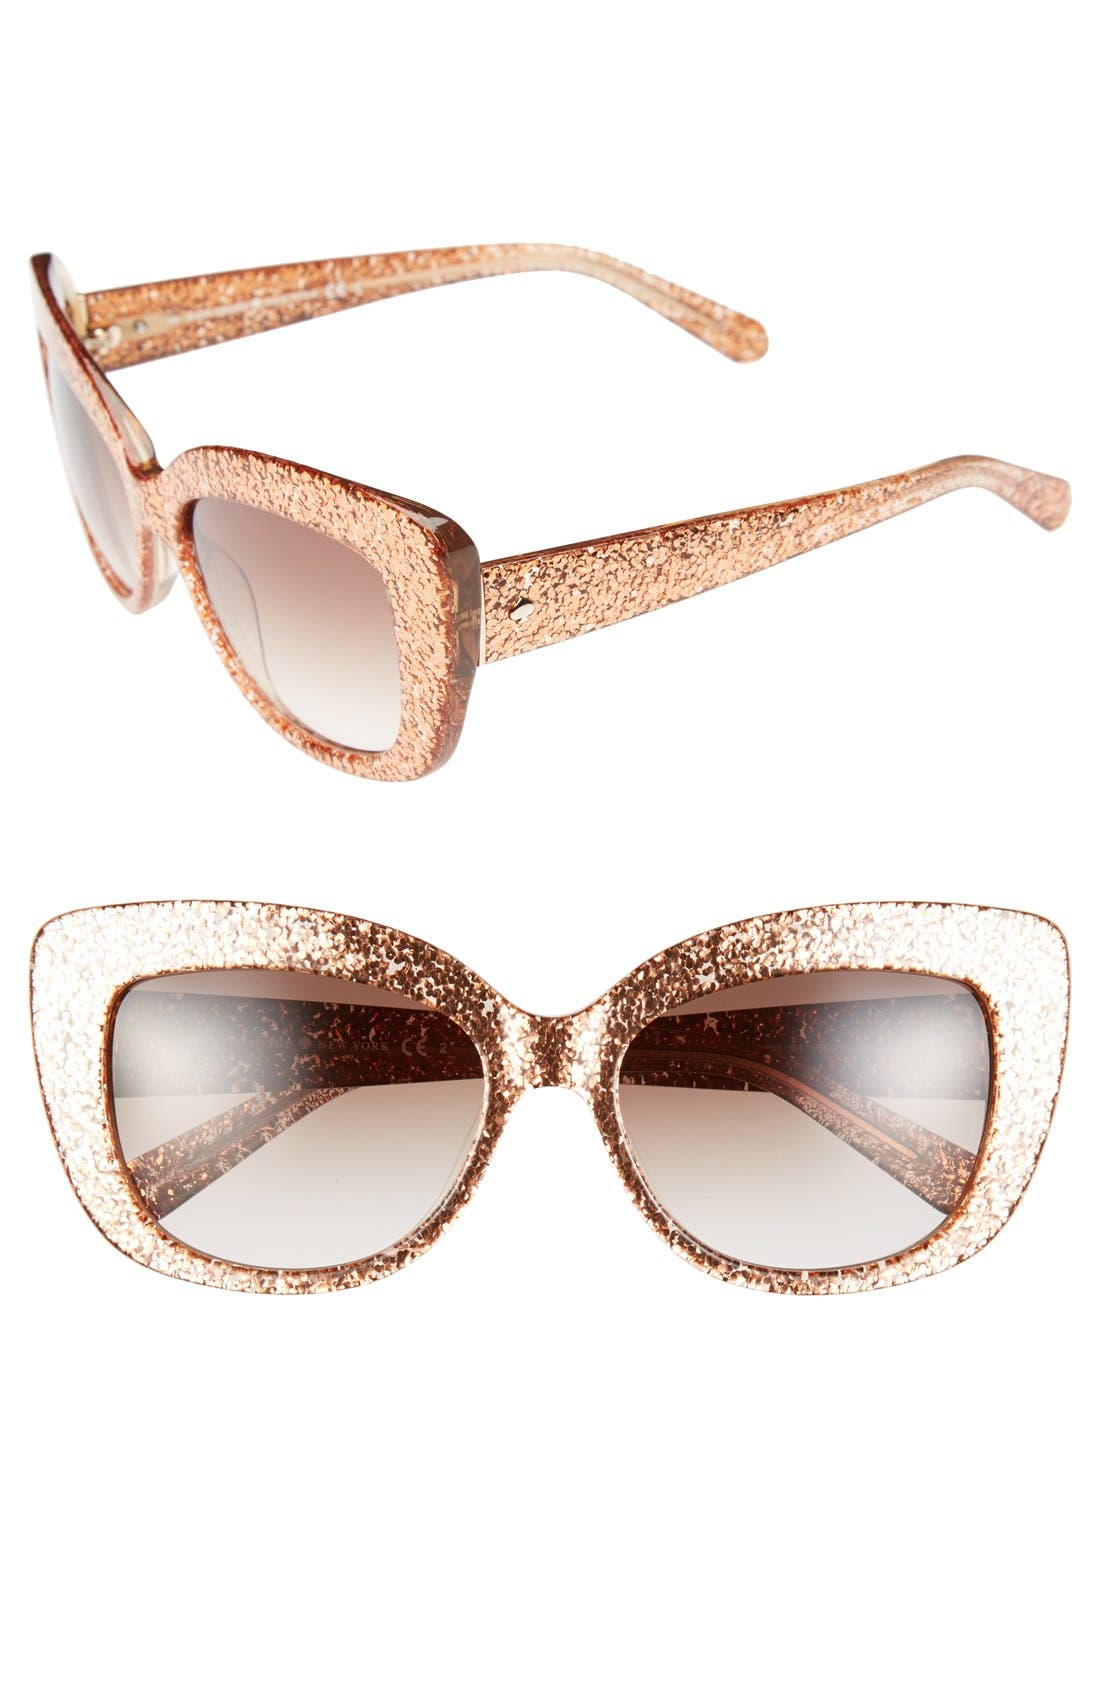 Alternate Image 1 Selected - kate spade new york 55mm cat eye sunglasses